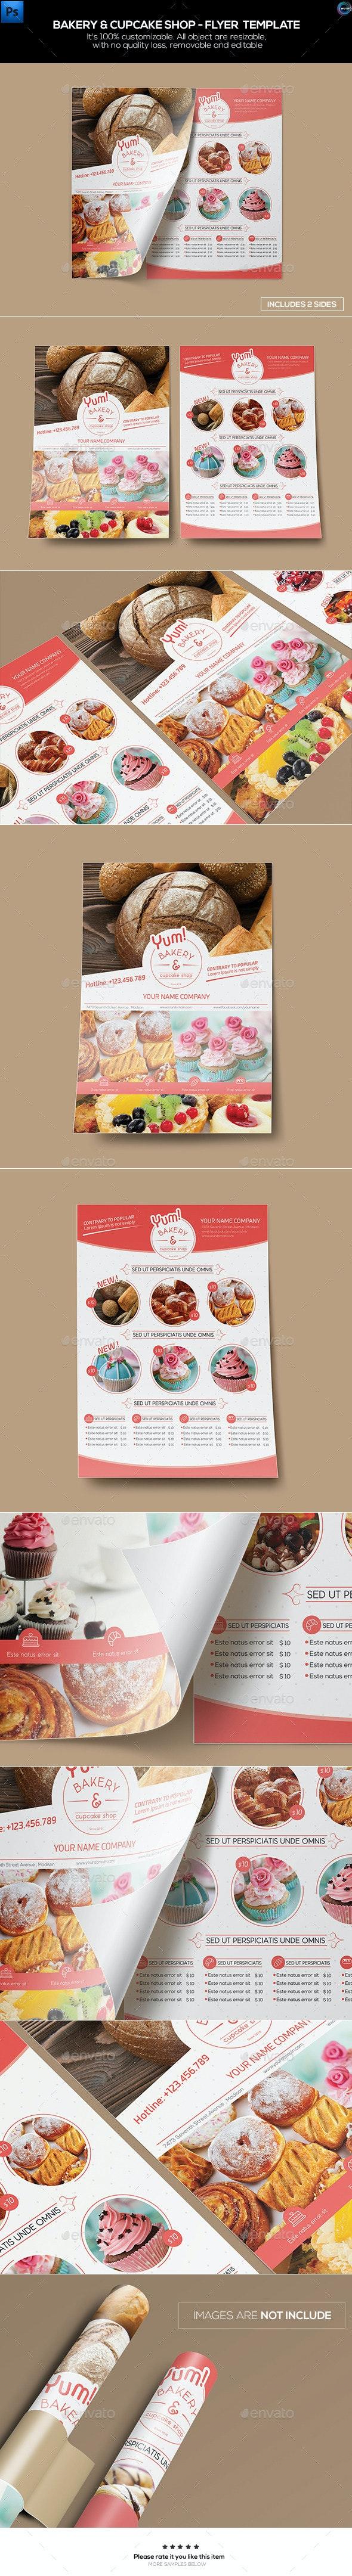 Bakery & Cupcake Shop - Flyer Template - Restaurant Flyers